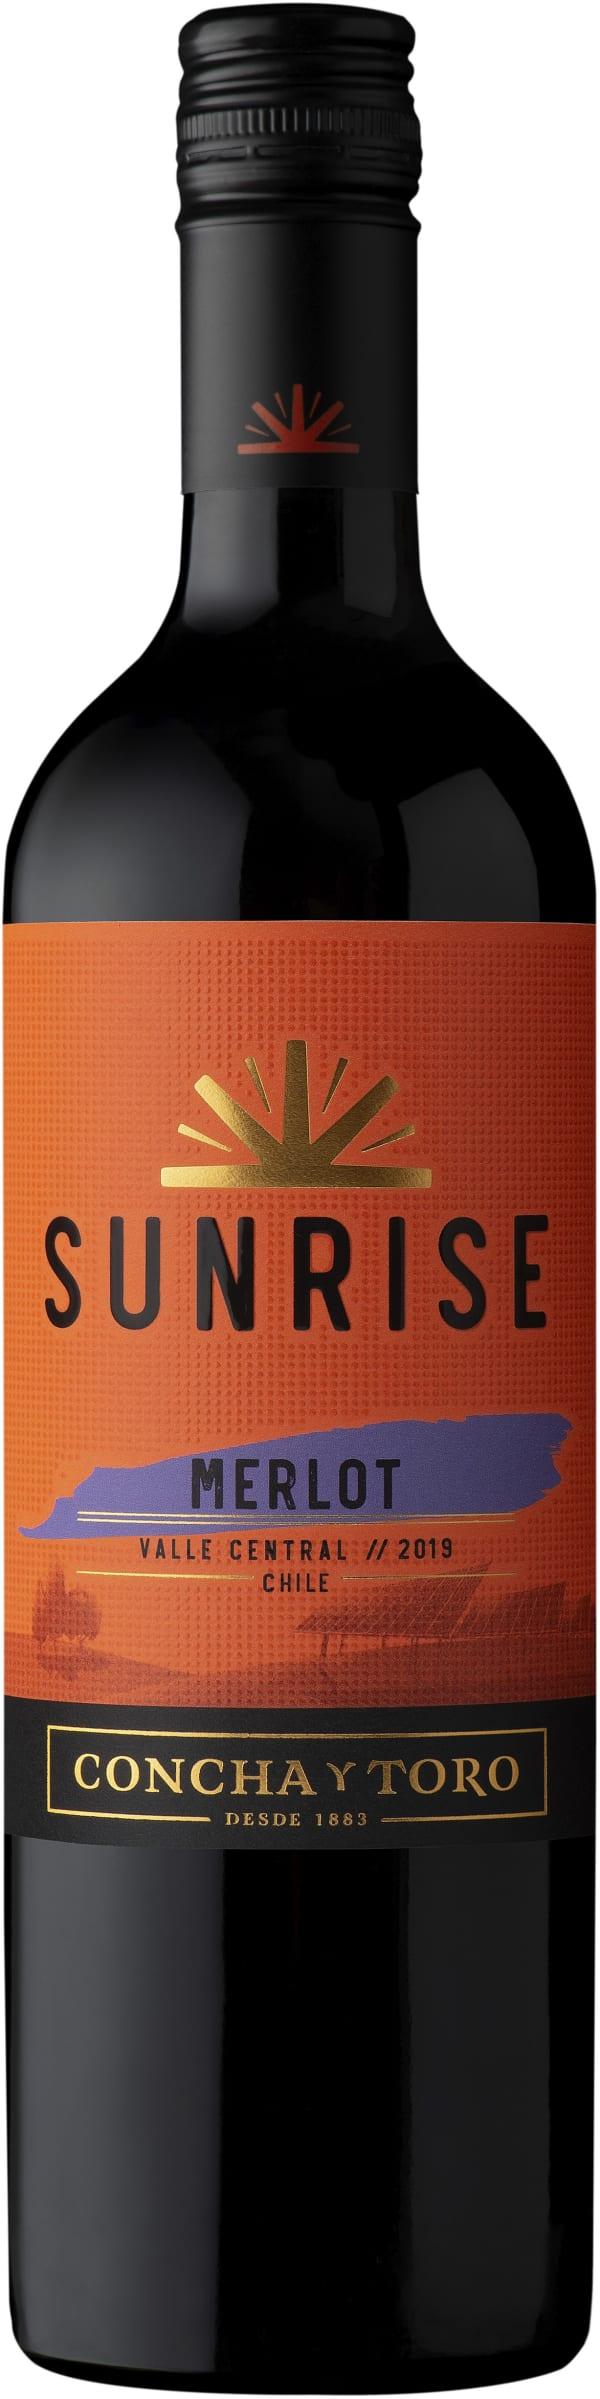 Sunrise Merlot 2019